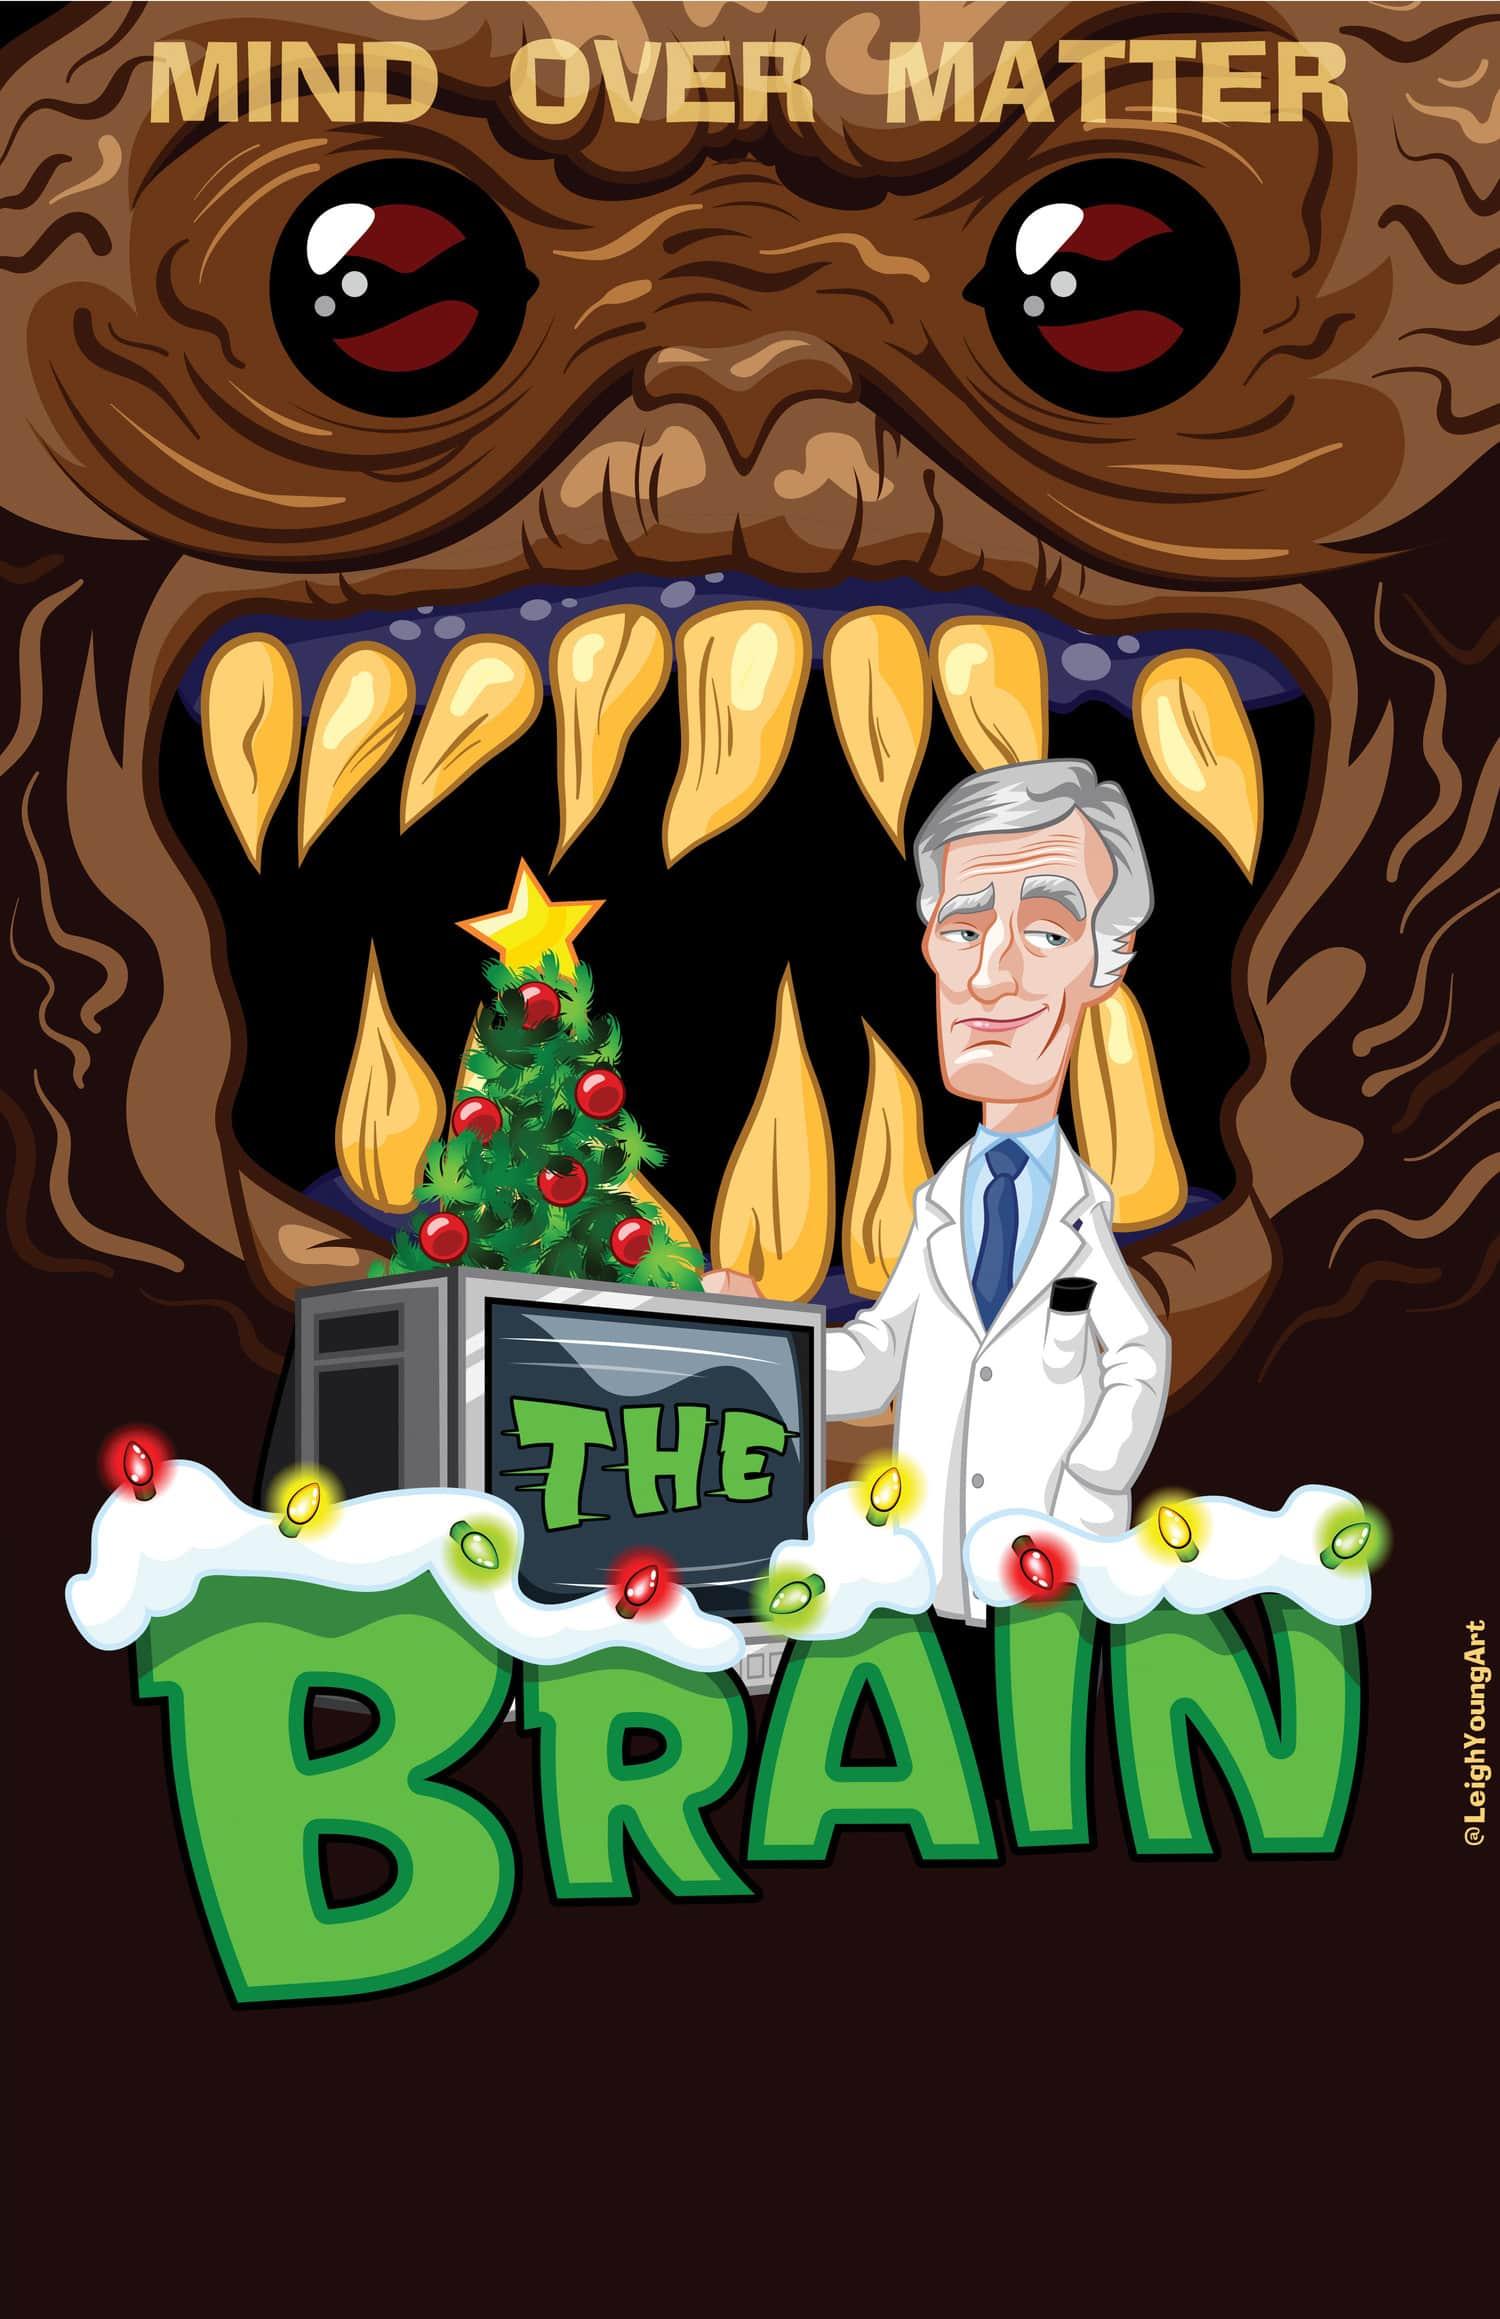 The Laser Blast Film Society Presents: The Brain